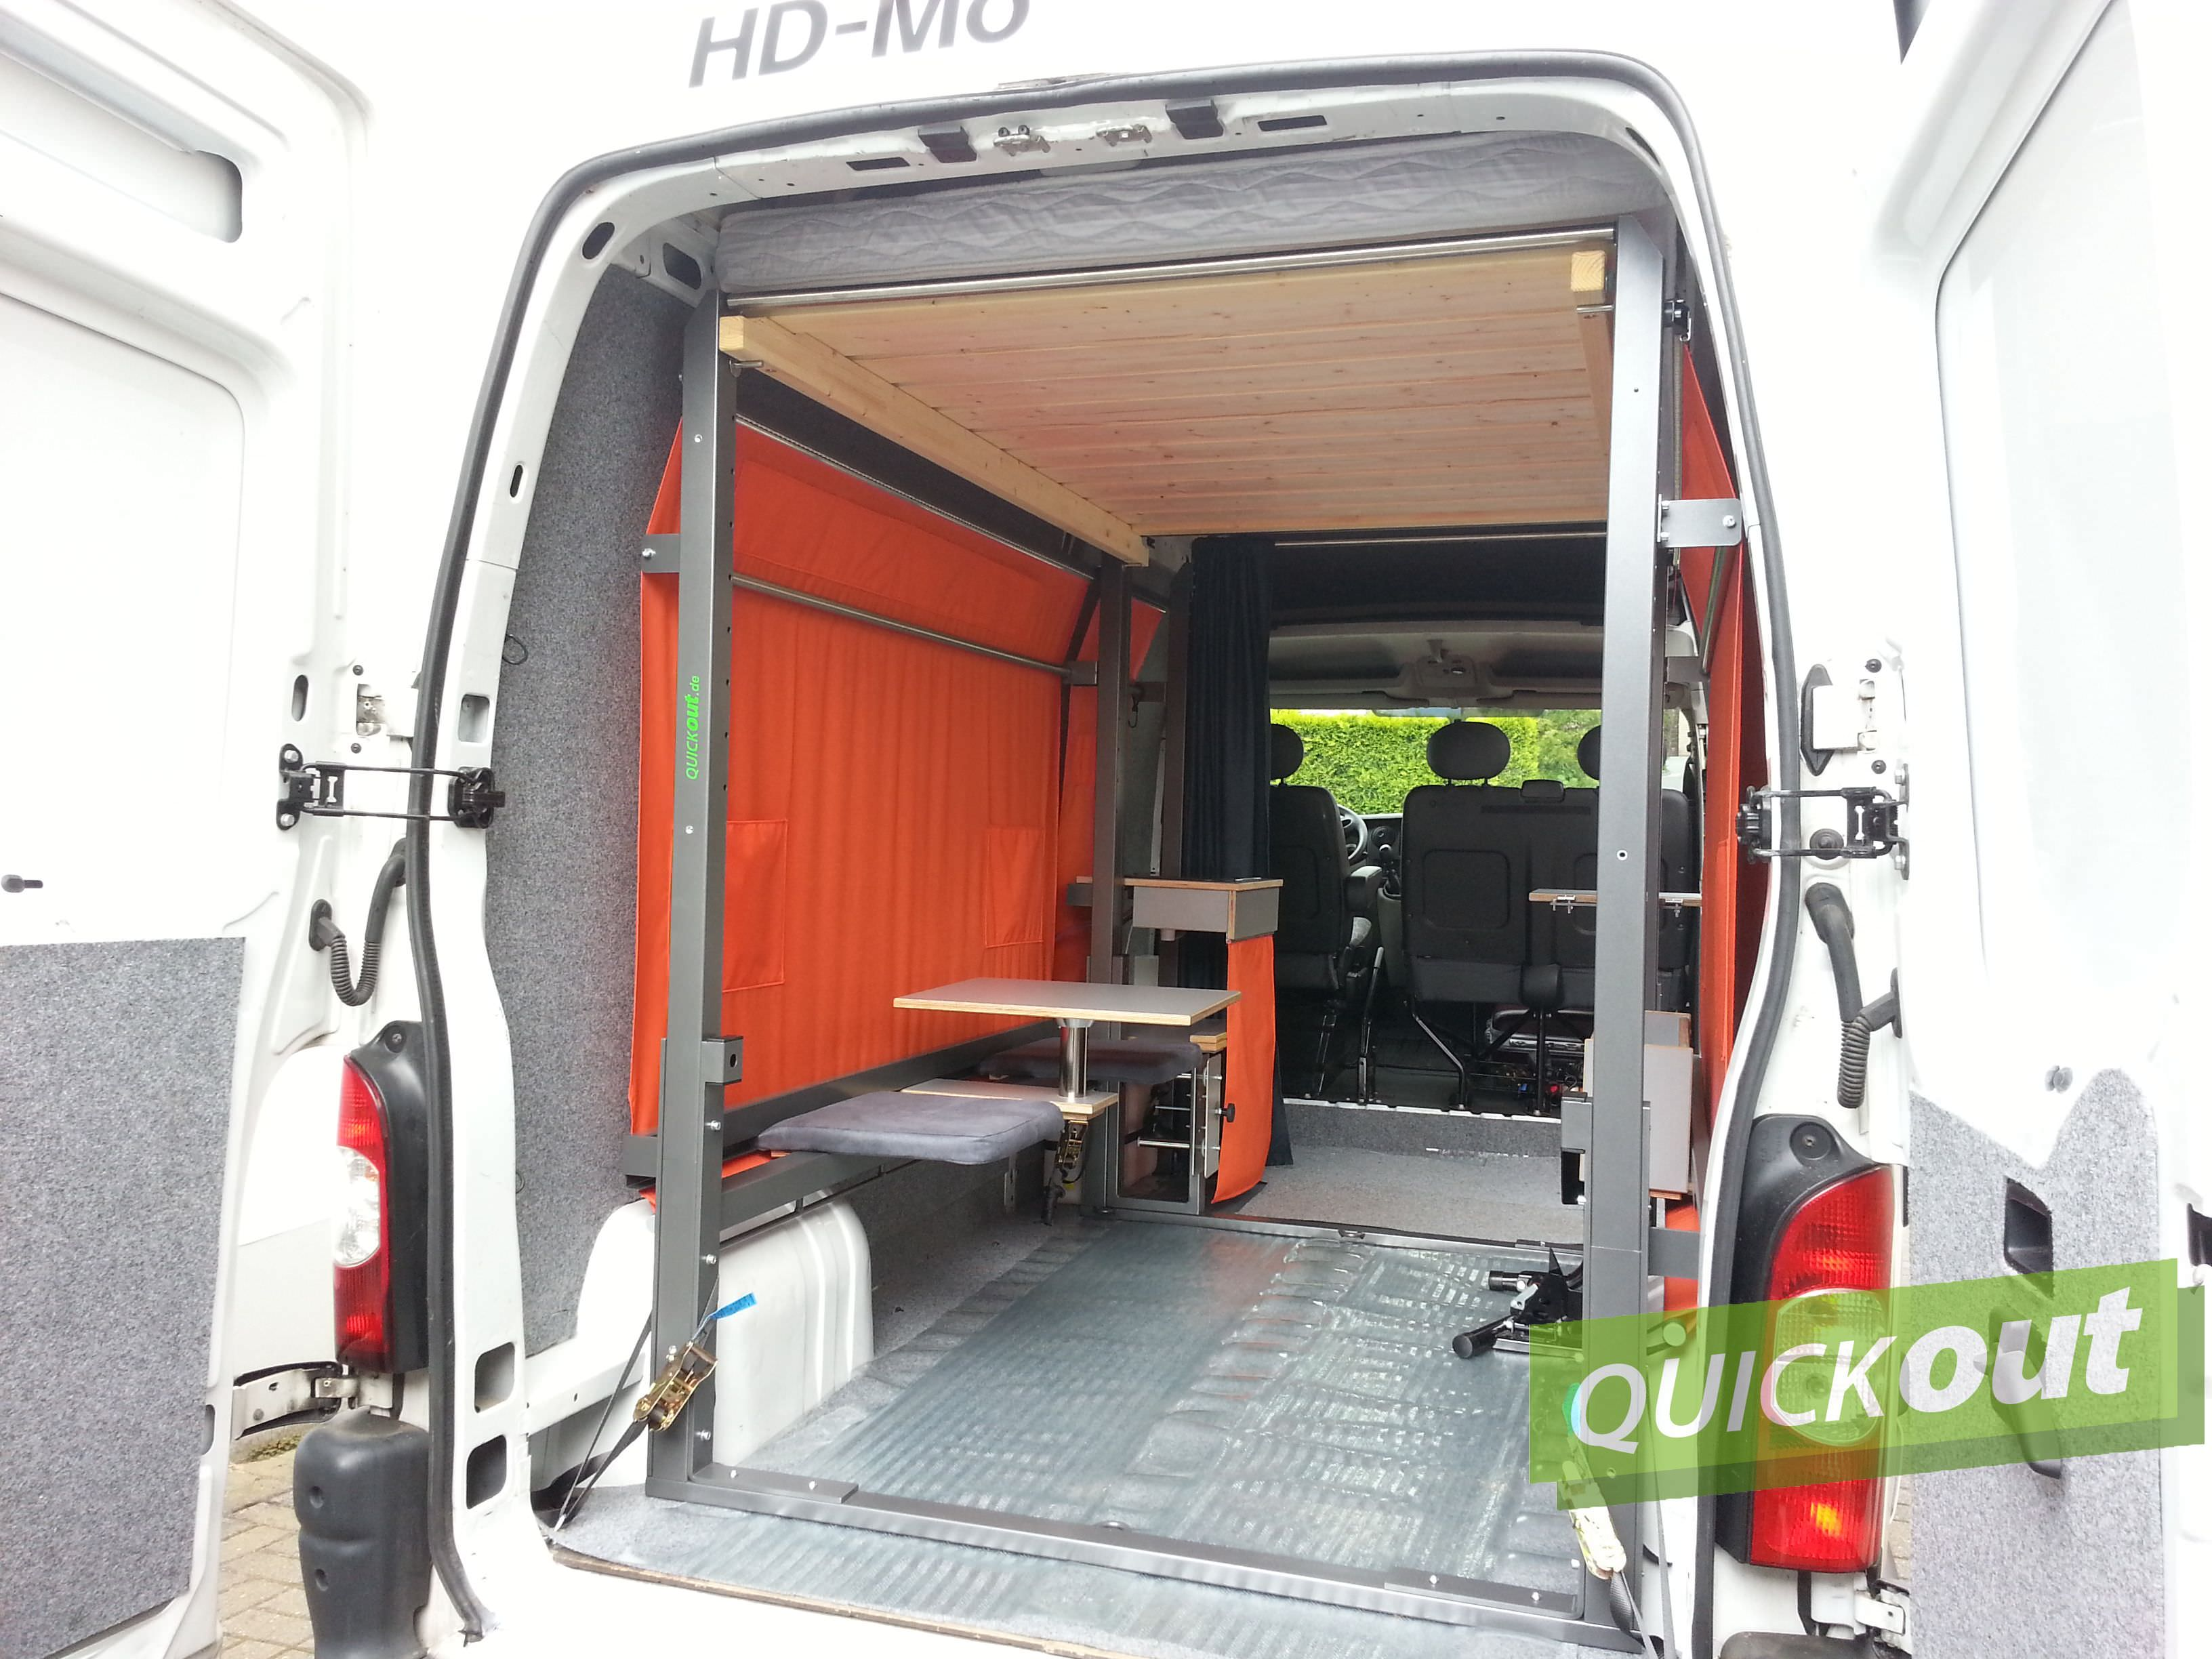 wohnmobil selbstausbau renault trafic renault wohnwagen. Black Bedroom Furniture Sets. Home Design Ideas